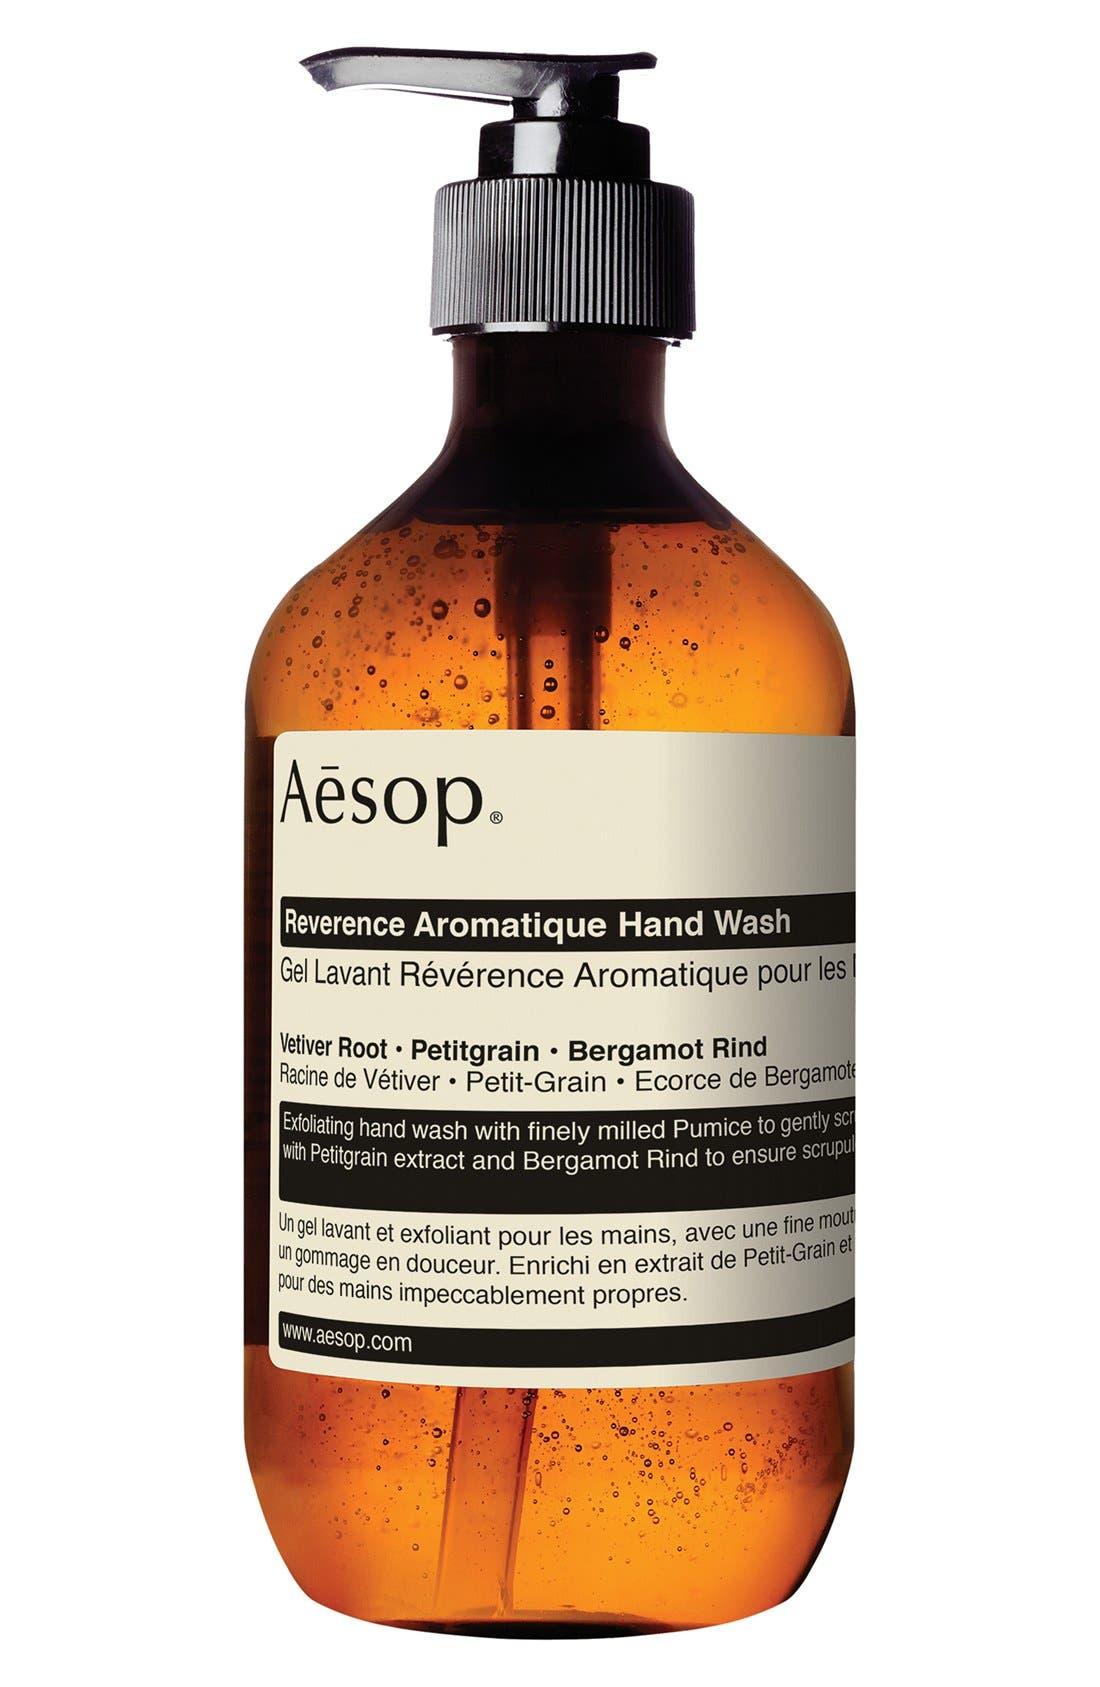 Reverence Aromatique Hand Wash | Nordstrom